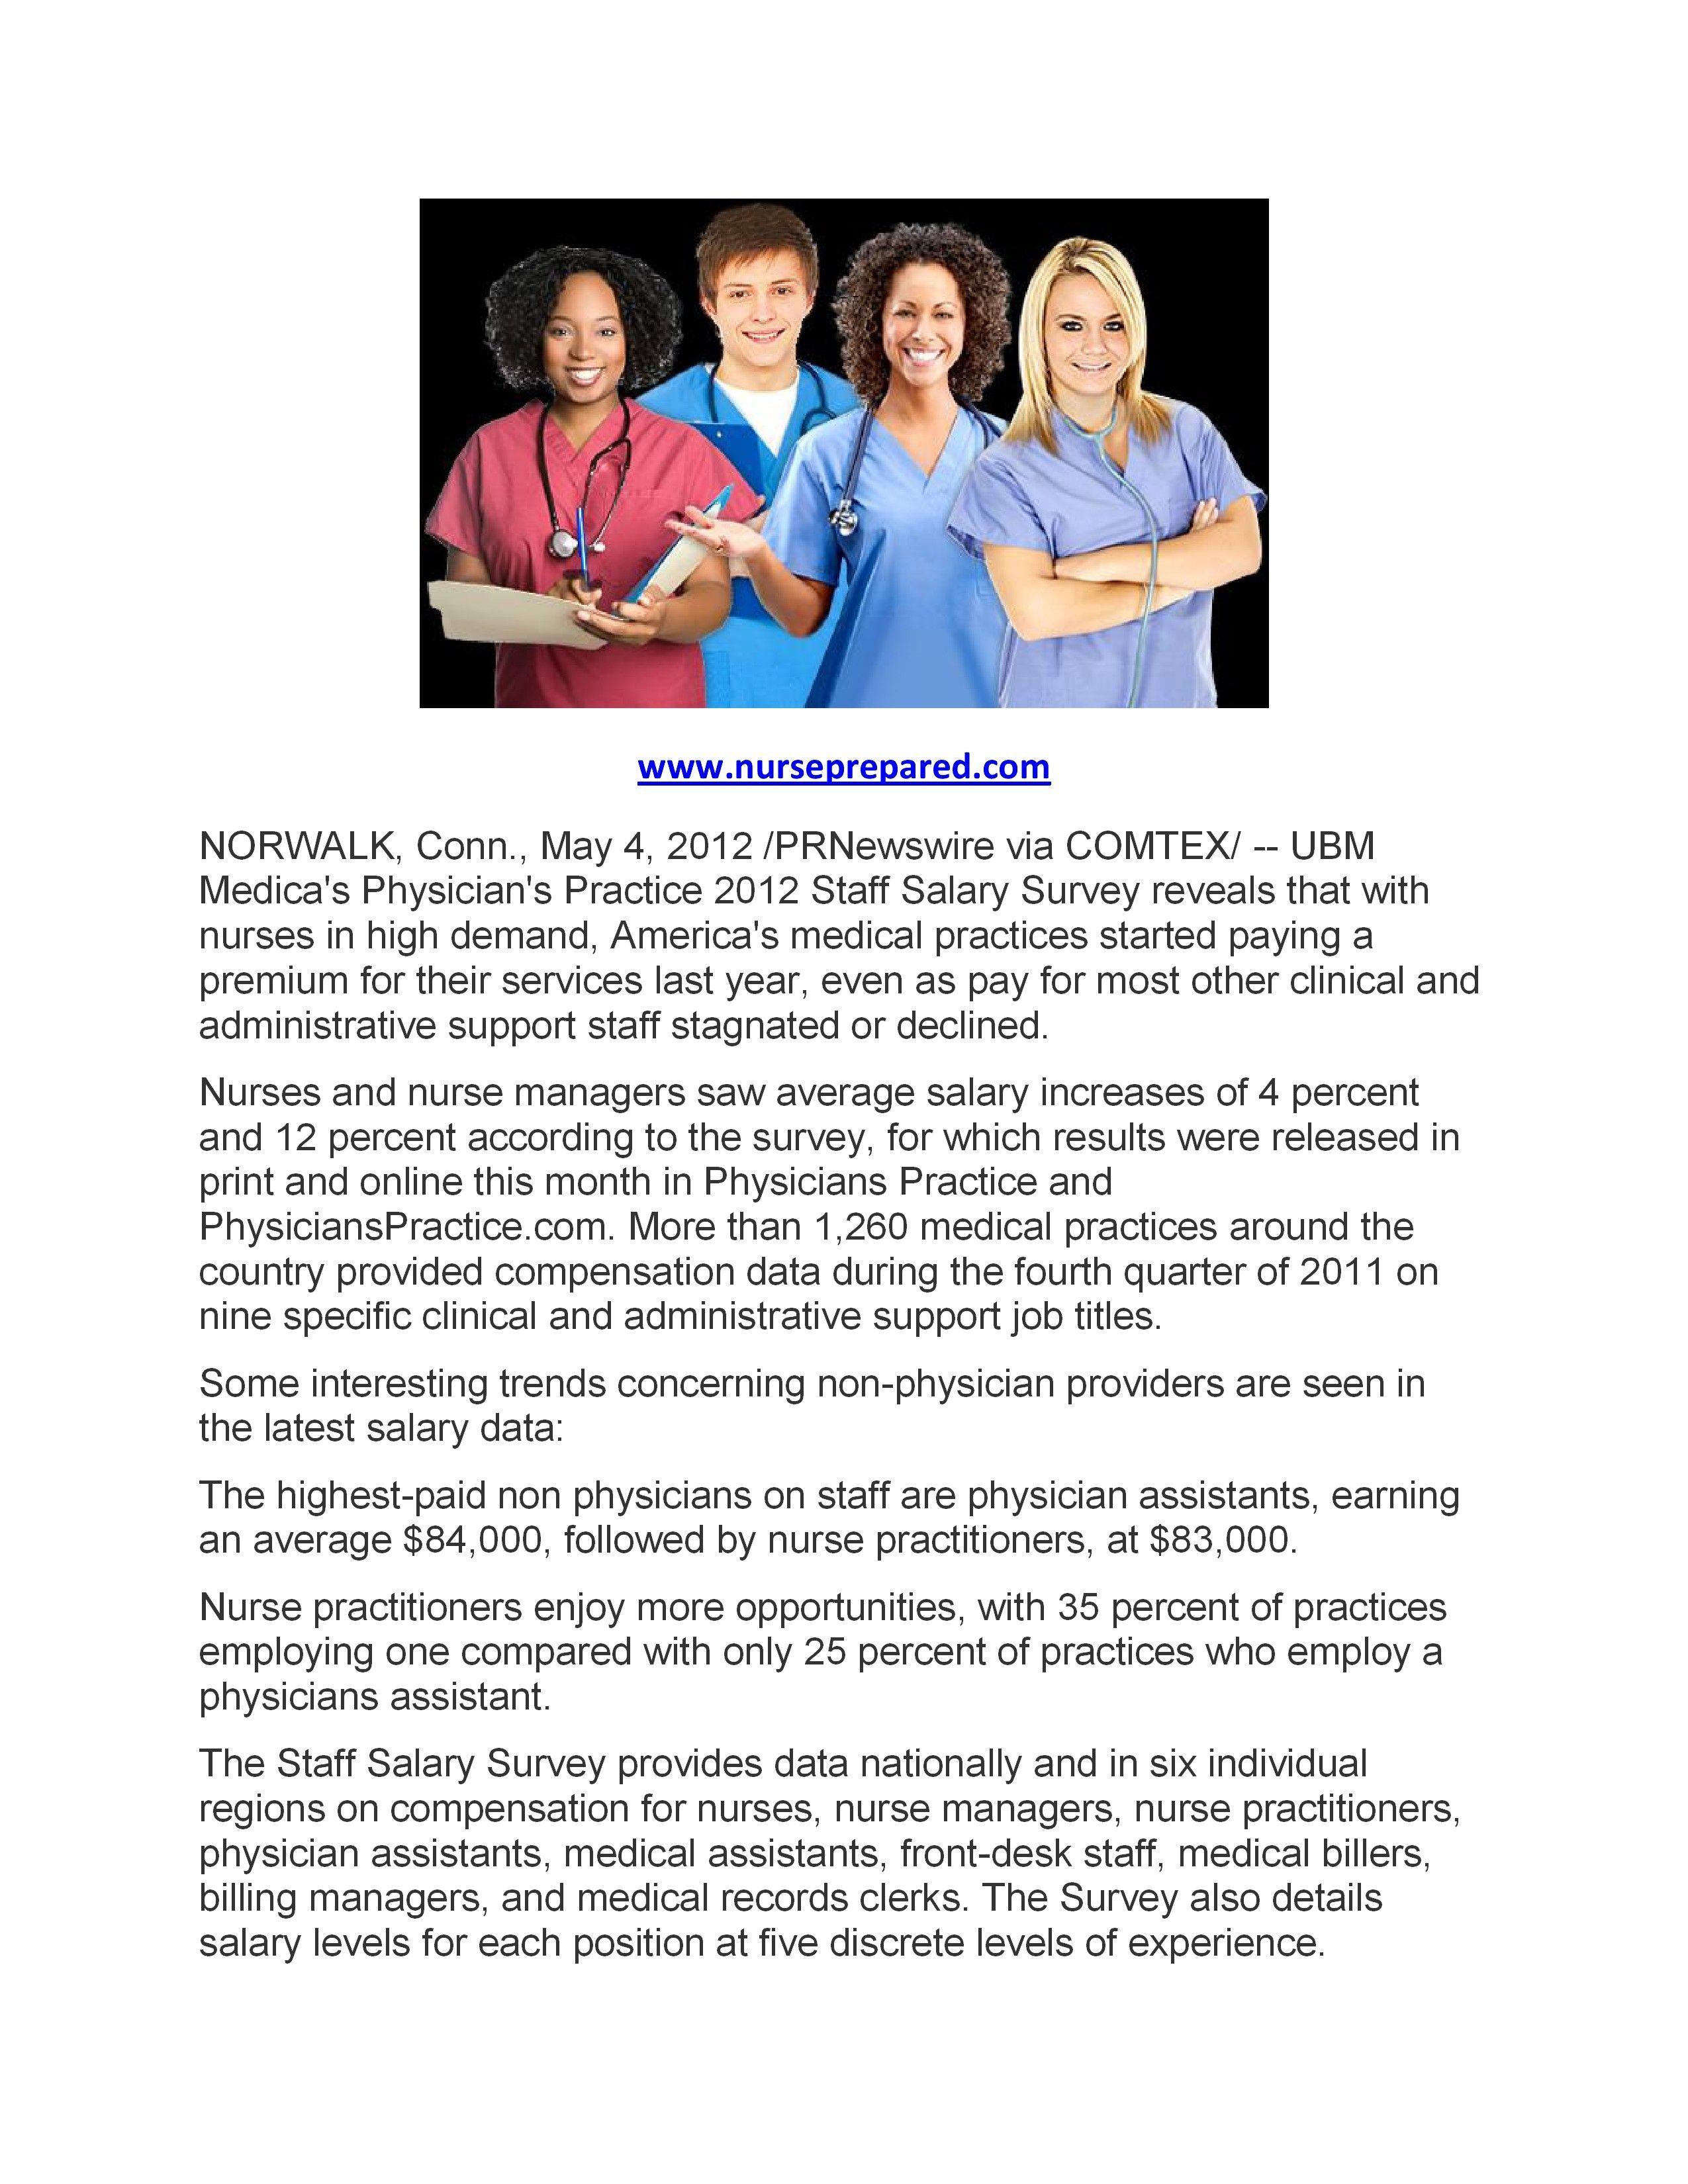 Nursing salaries increase nursing students nurse